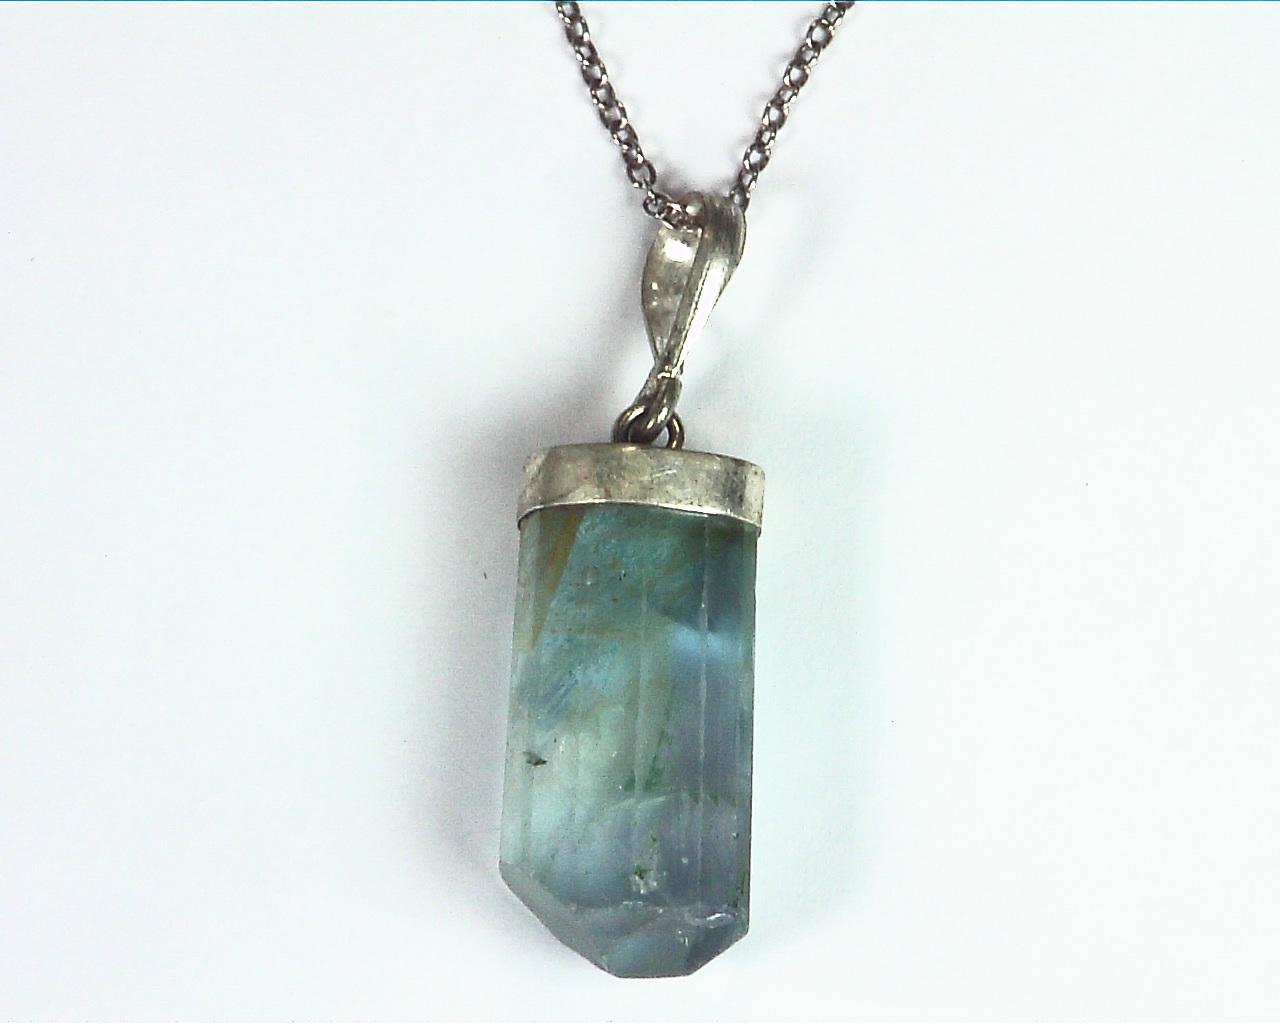 Fluorite Natural Genuine Gemstone Crystal Sterling Silver Pendent PSS,983 5